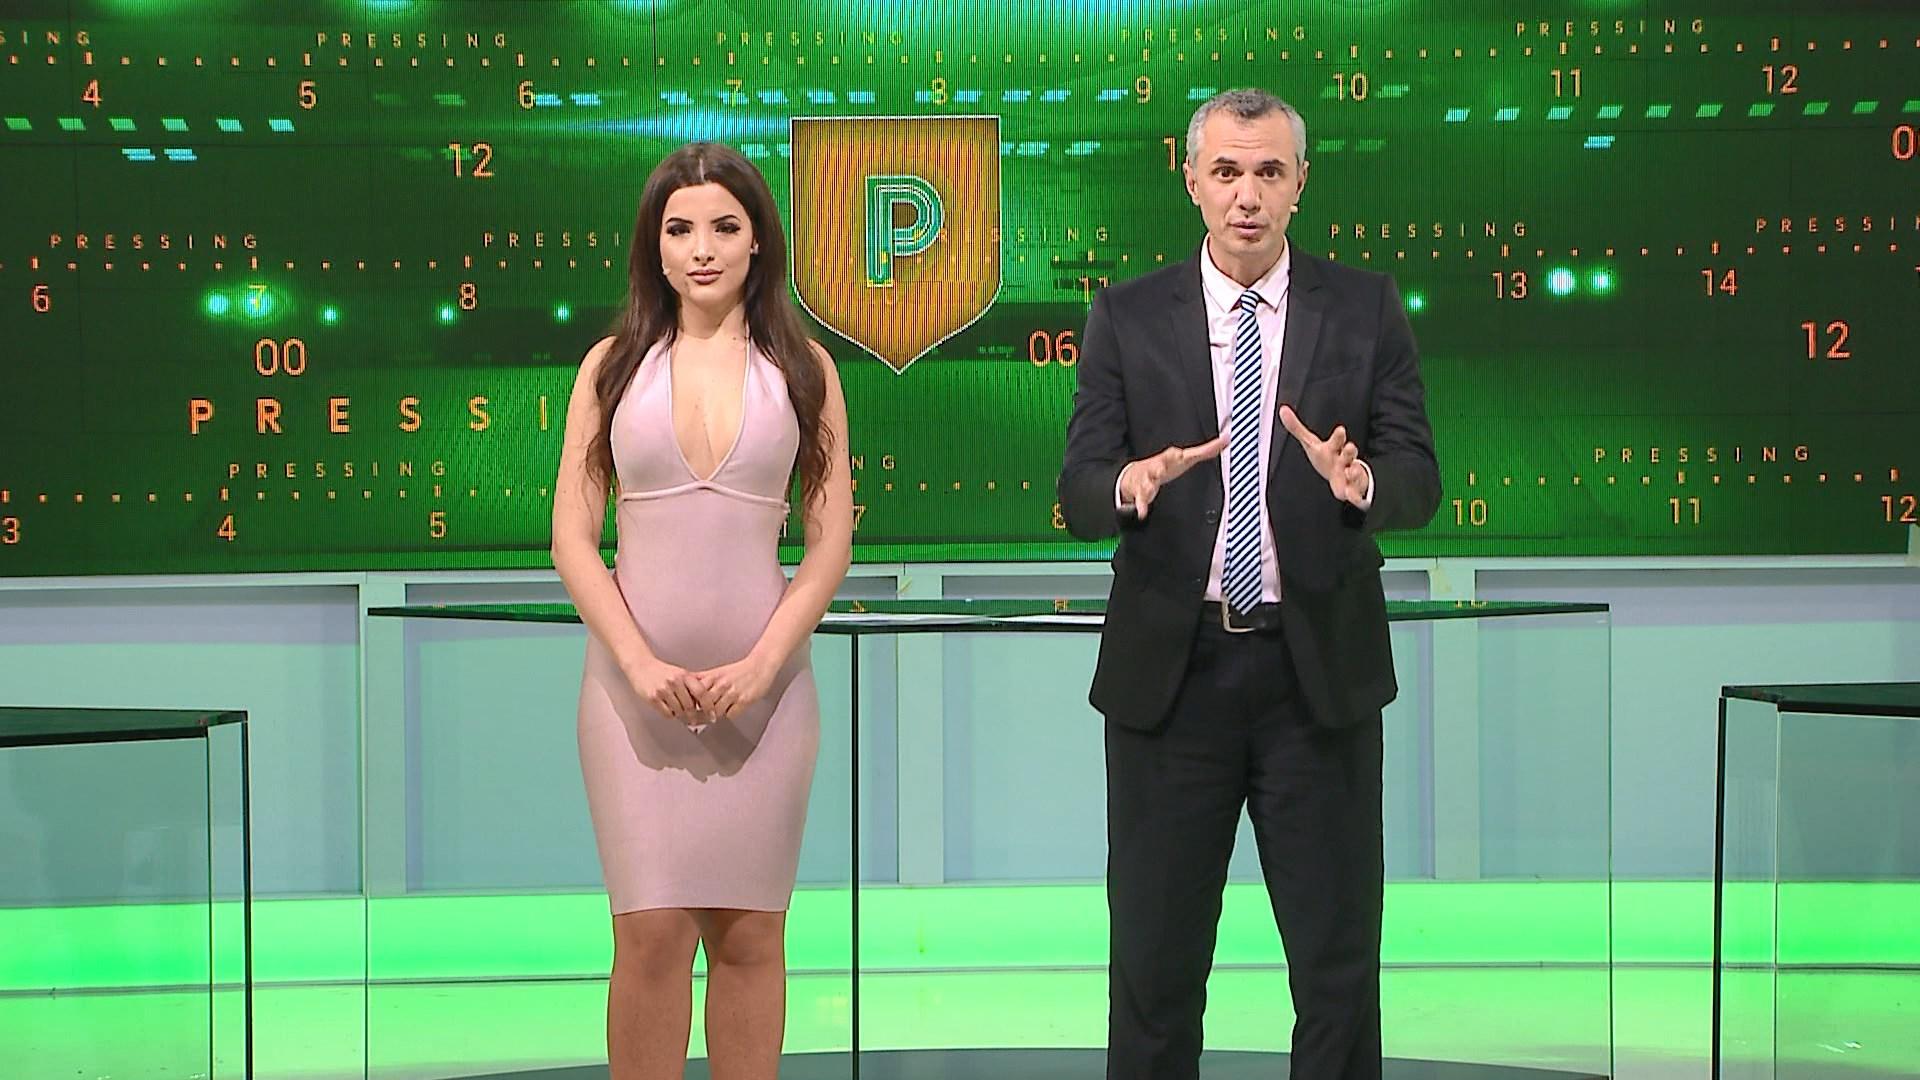 "Emisioni ""Pressing"", 11 Shkurt 2019"